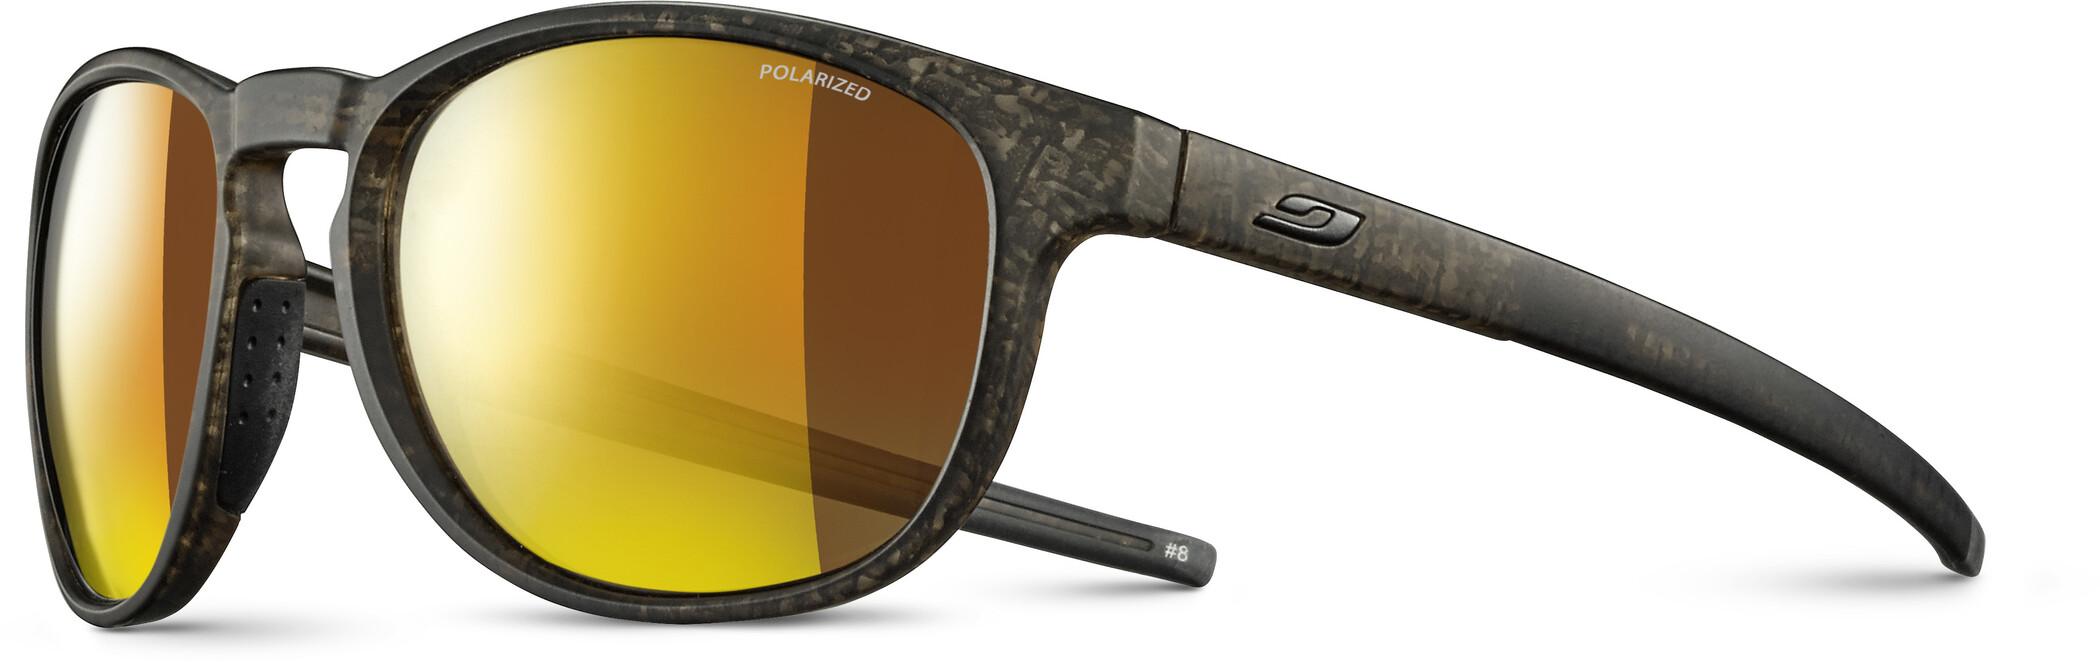 Julbo Elevate Polarized 3CF Solbriller, brown/black/multilayer gold (2020) | Glasses